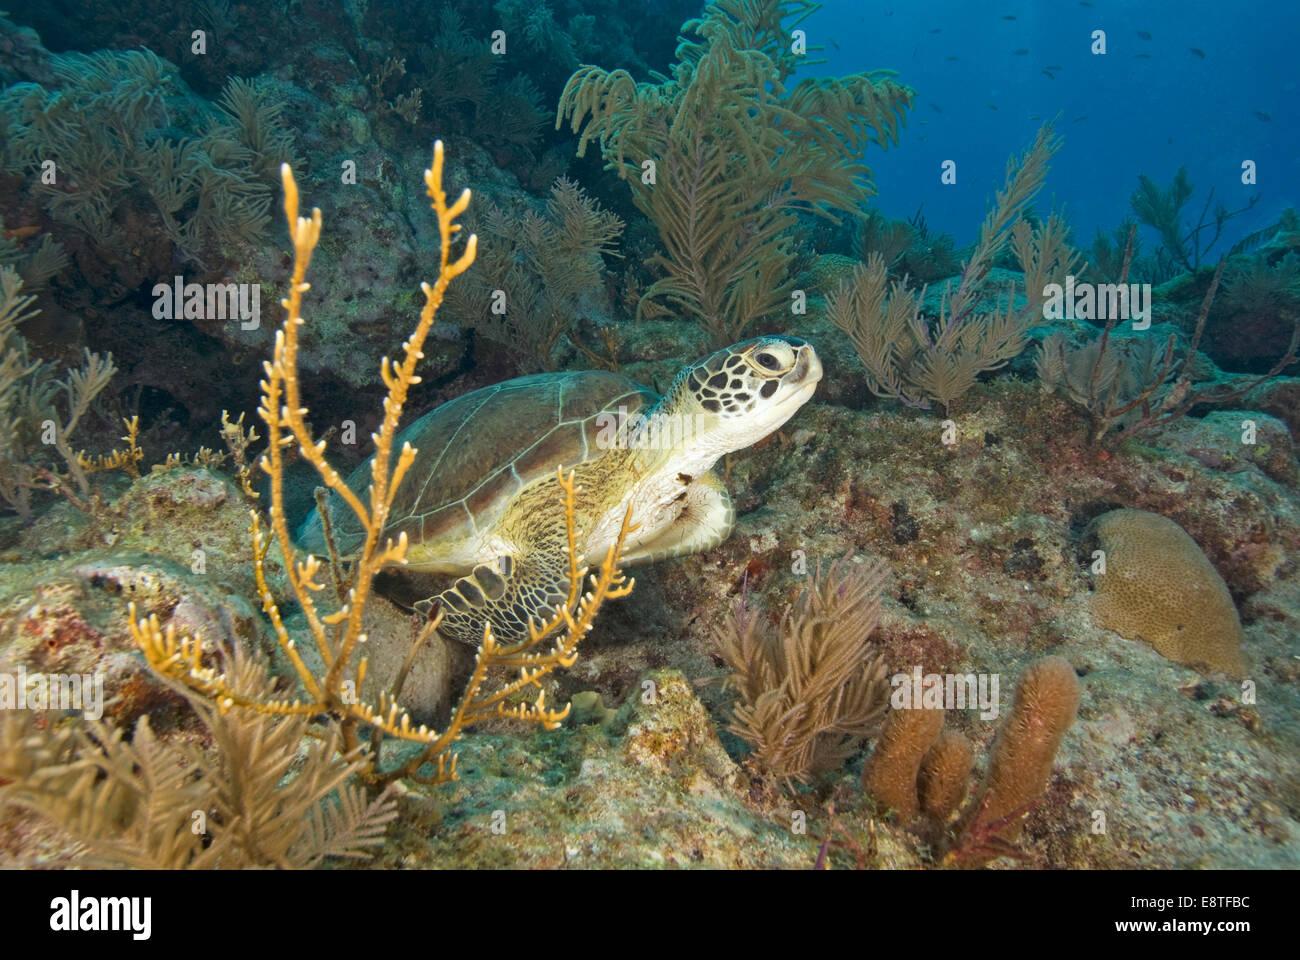 Underwater sea turtle at Key largo coral reef Stock Photo